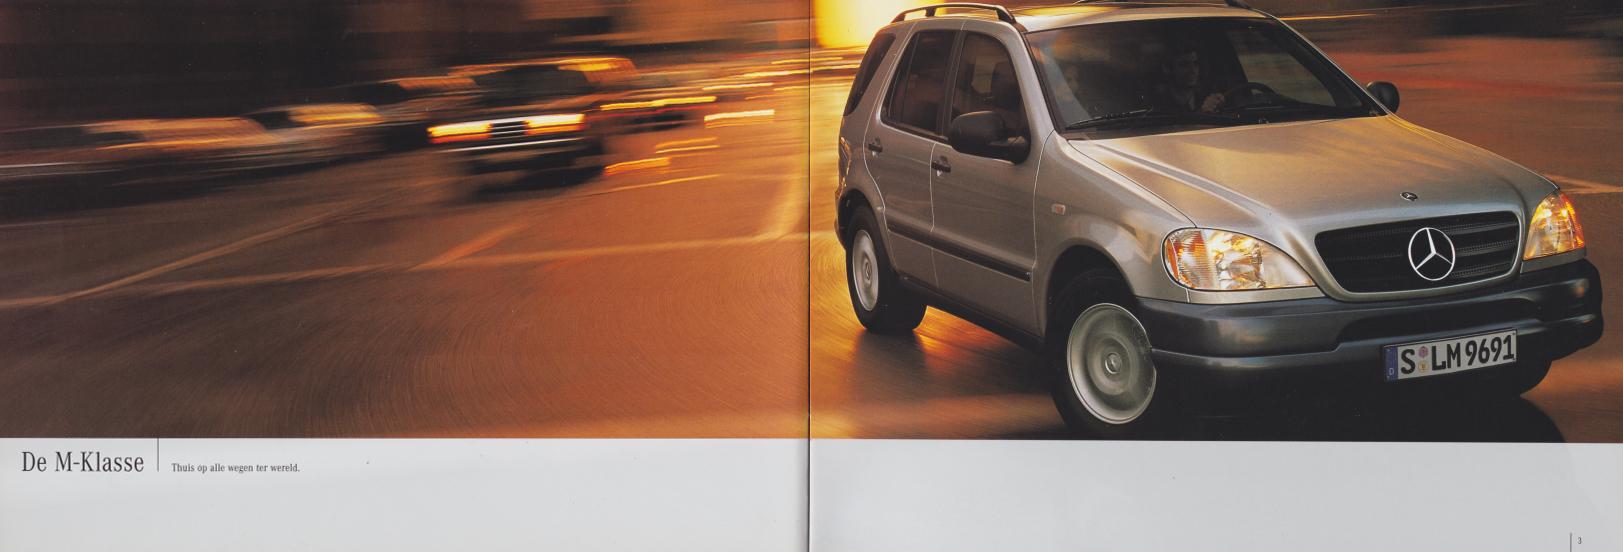 (W163): Catálogo 2001 - acessórios - neerlandês 002